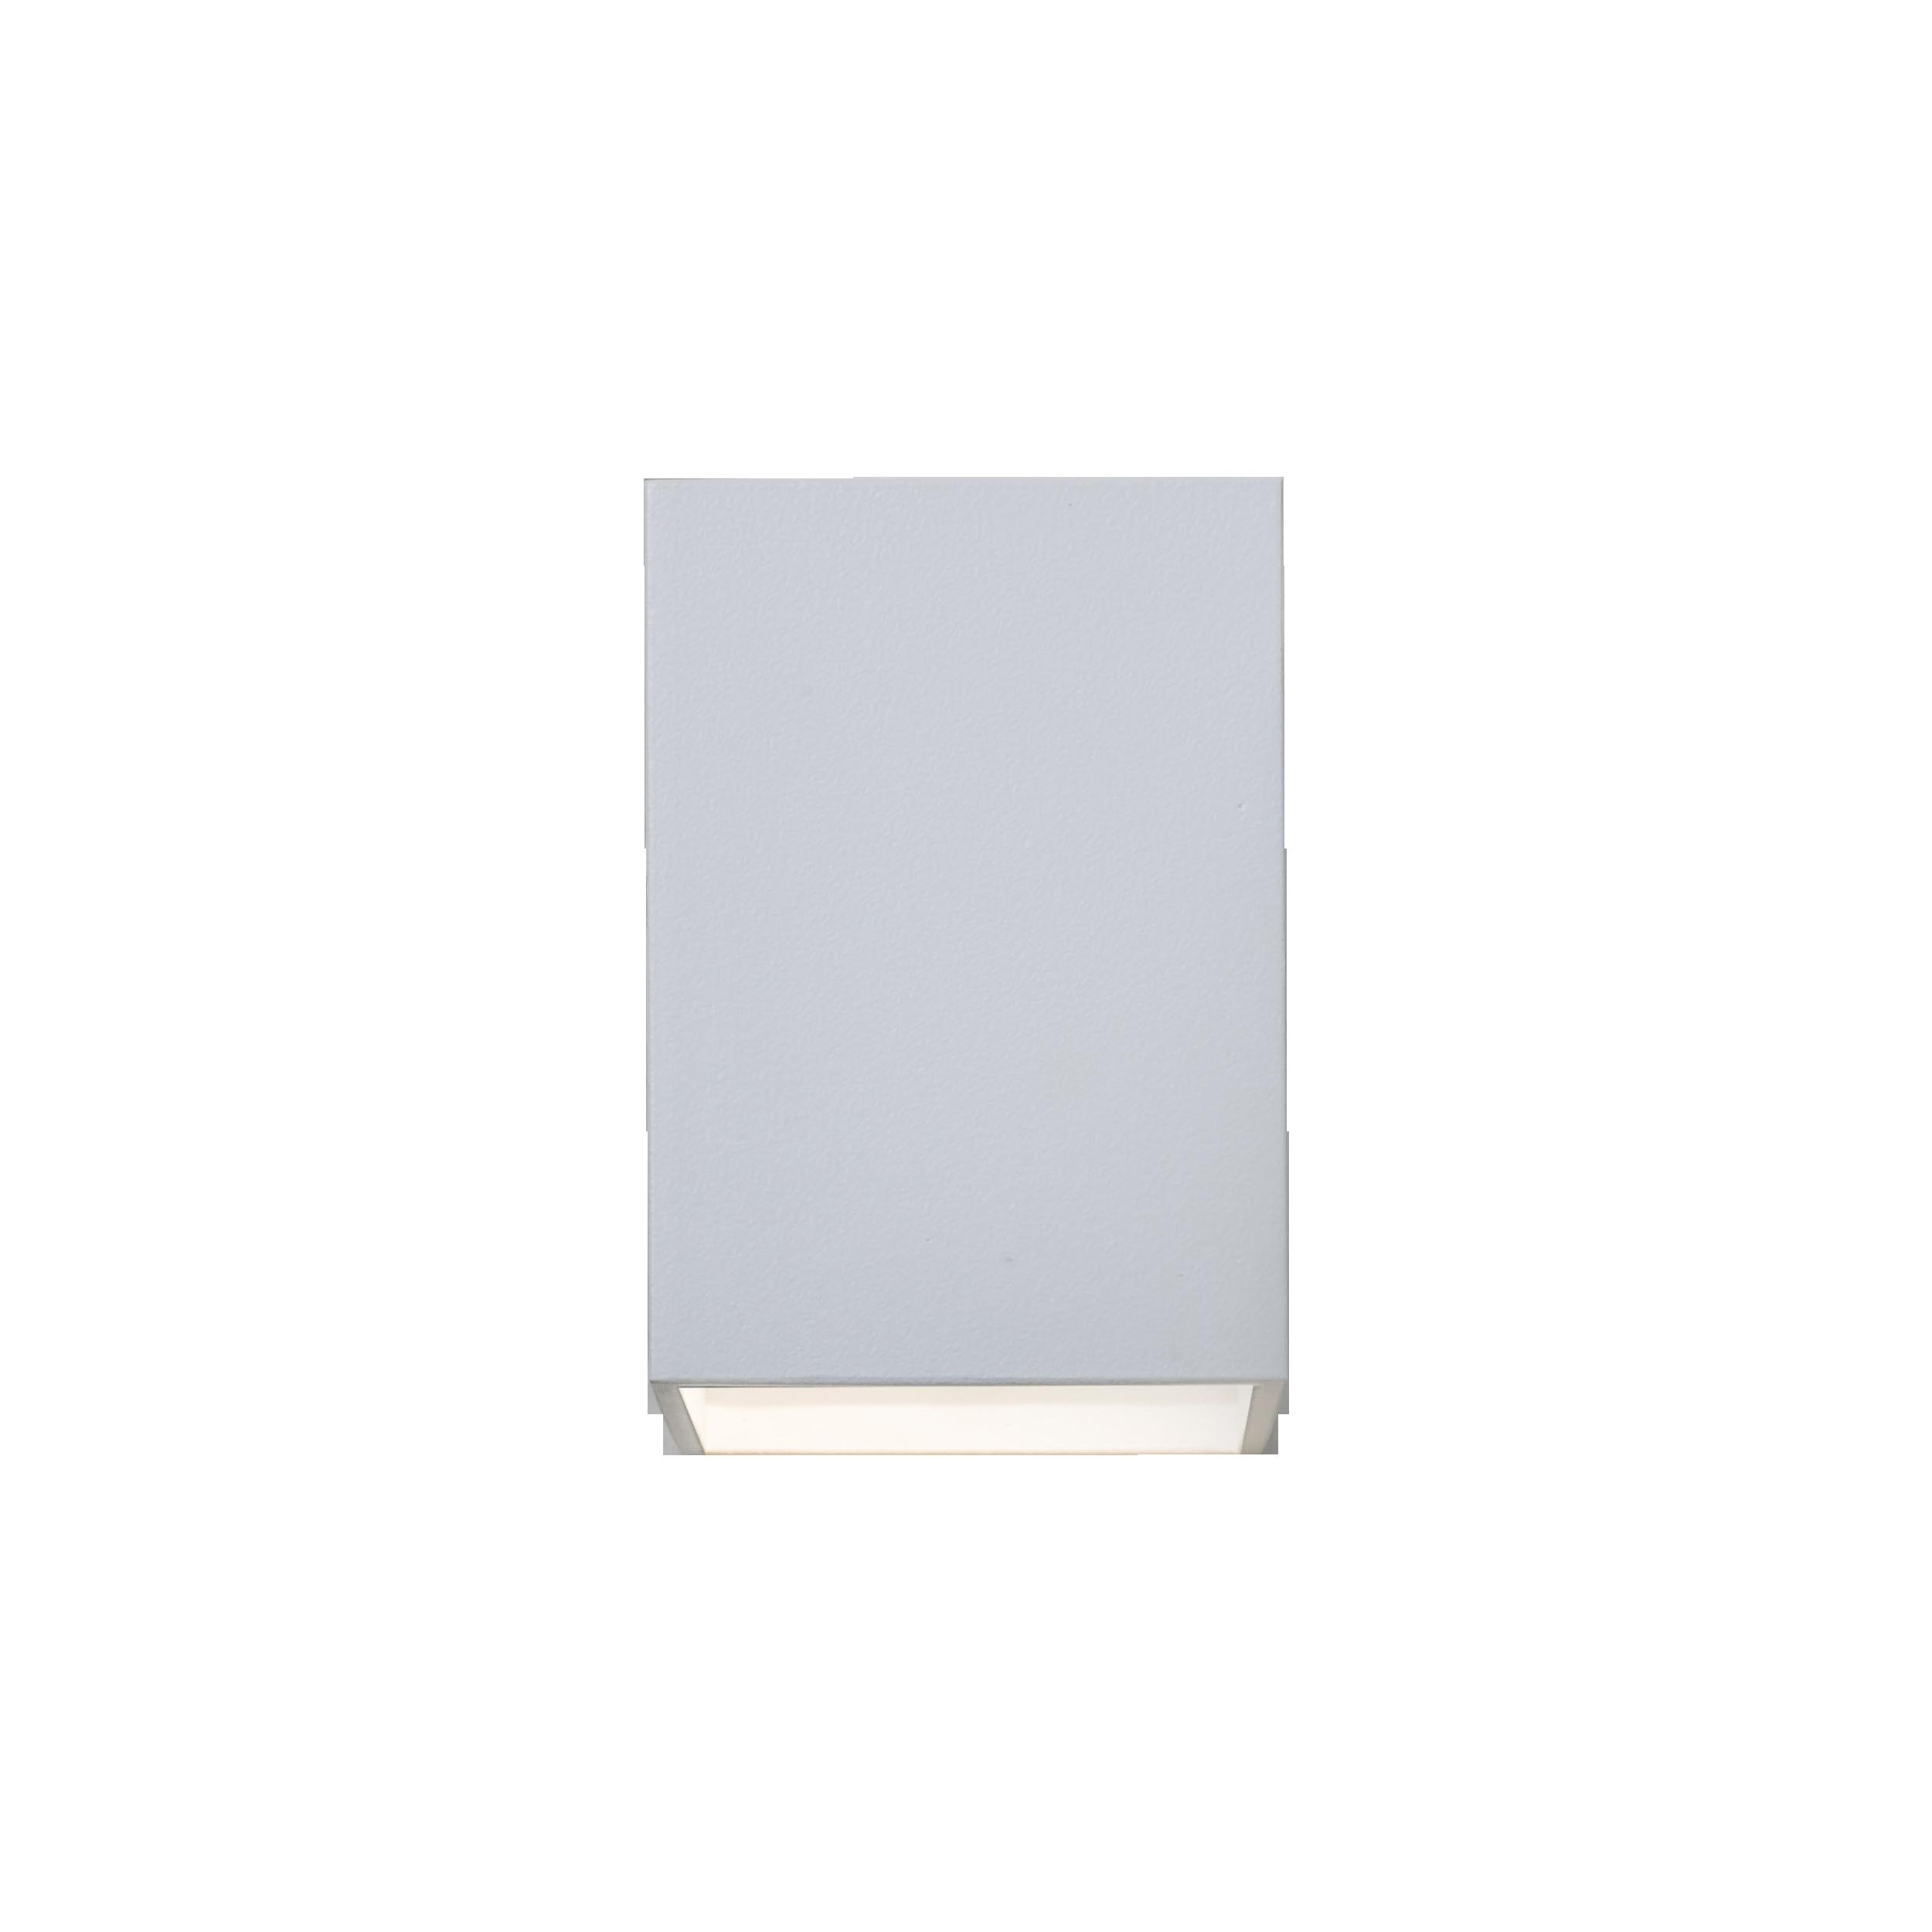 White 3w Led Ip65 Exterior Wall Light 7493 Datasheet